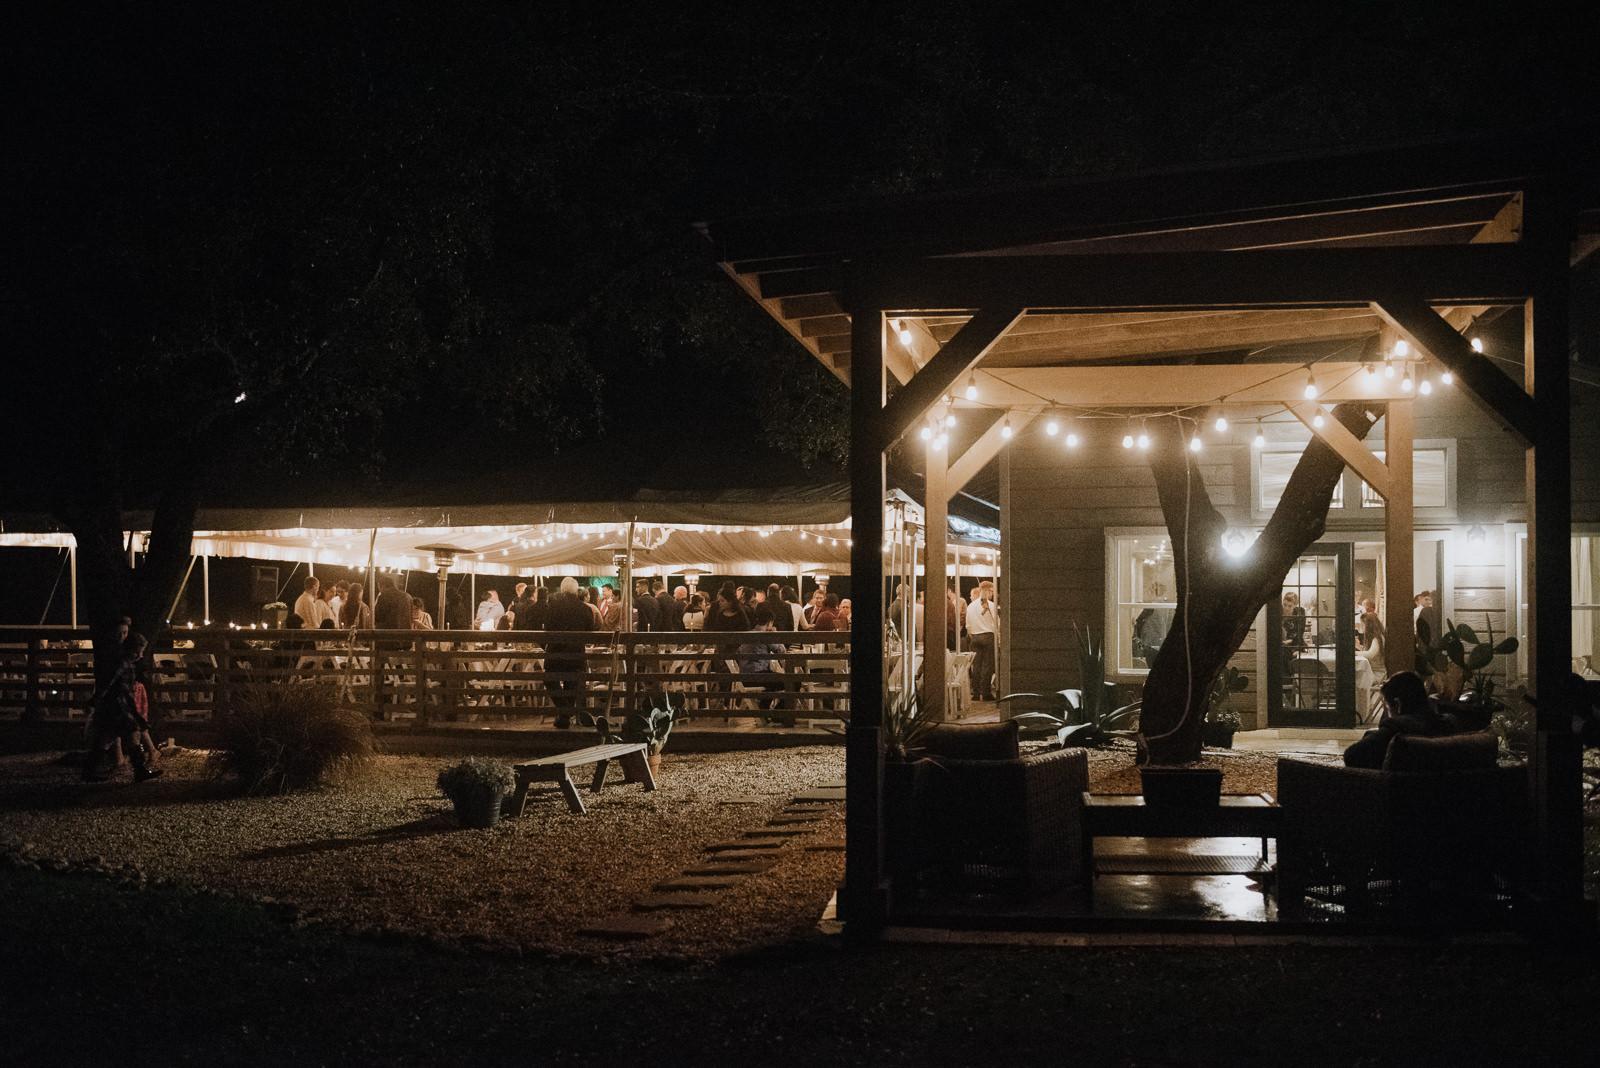 stonehouse villa at night in driftwood texas